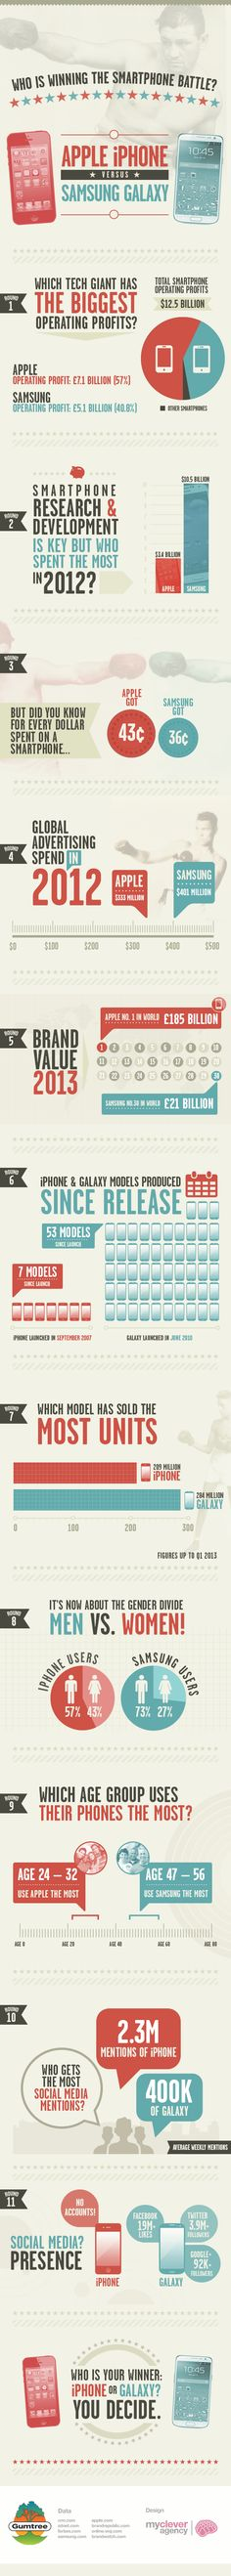 Gumtree Infographic iPhone vs Galaxy #Infogrpahic